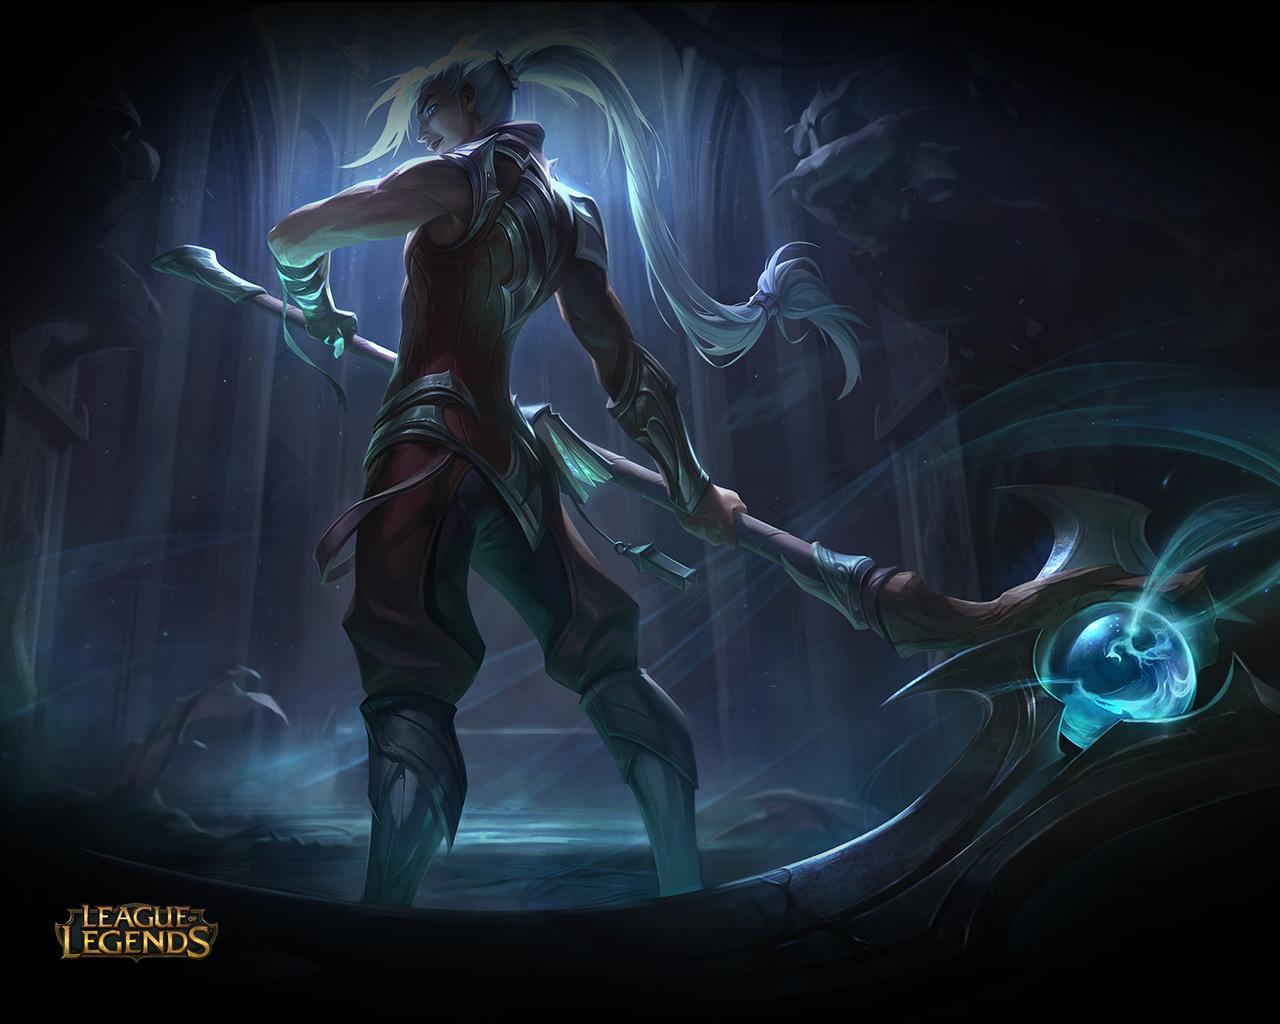 Best Game Kayn League Of Legends Wallpaper League Of